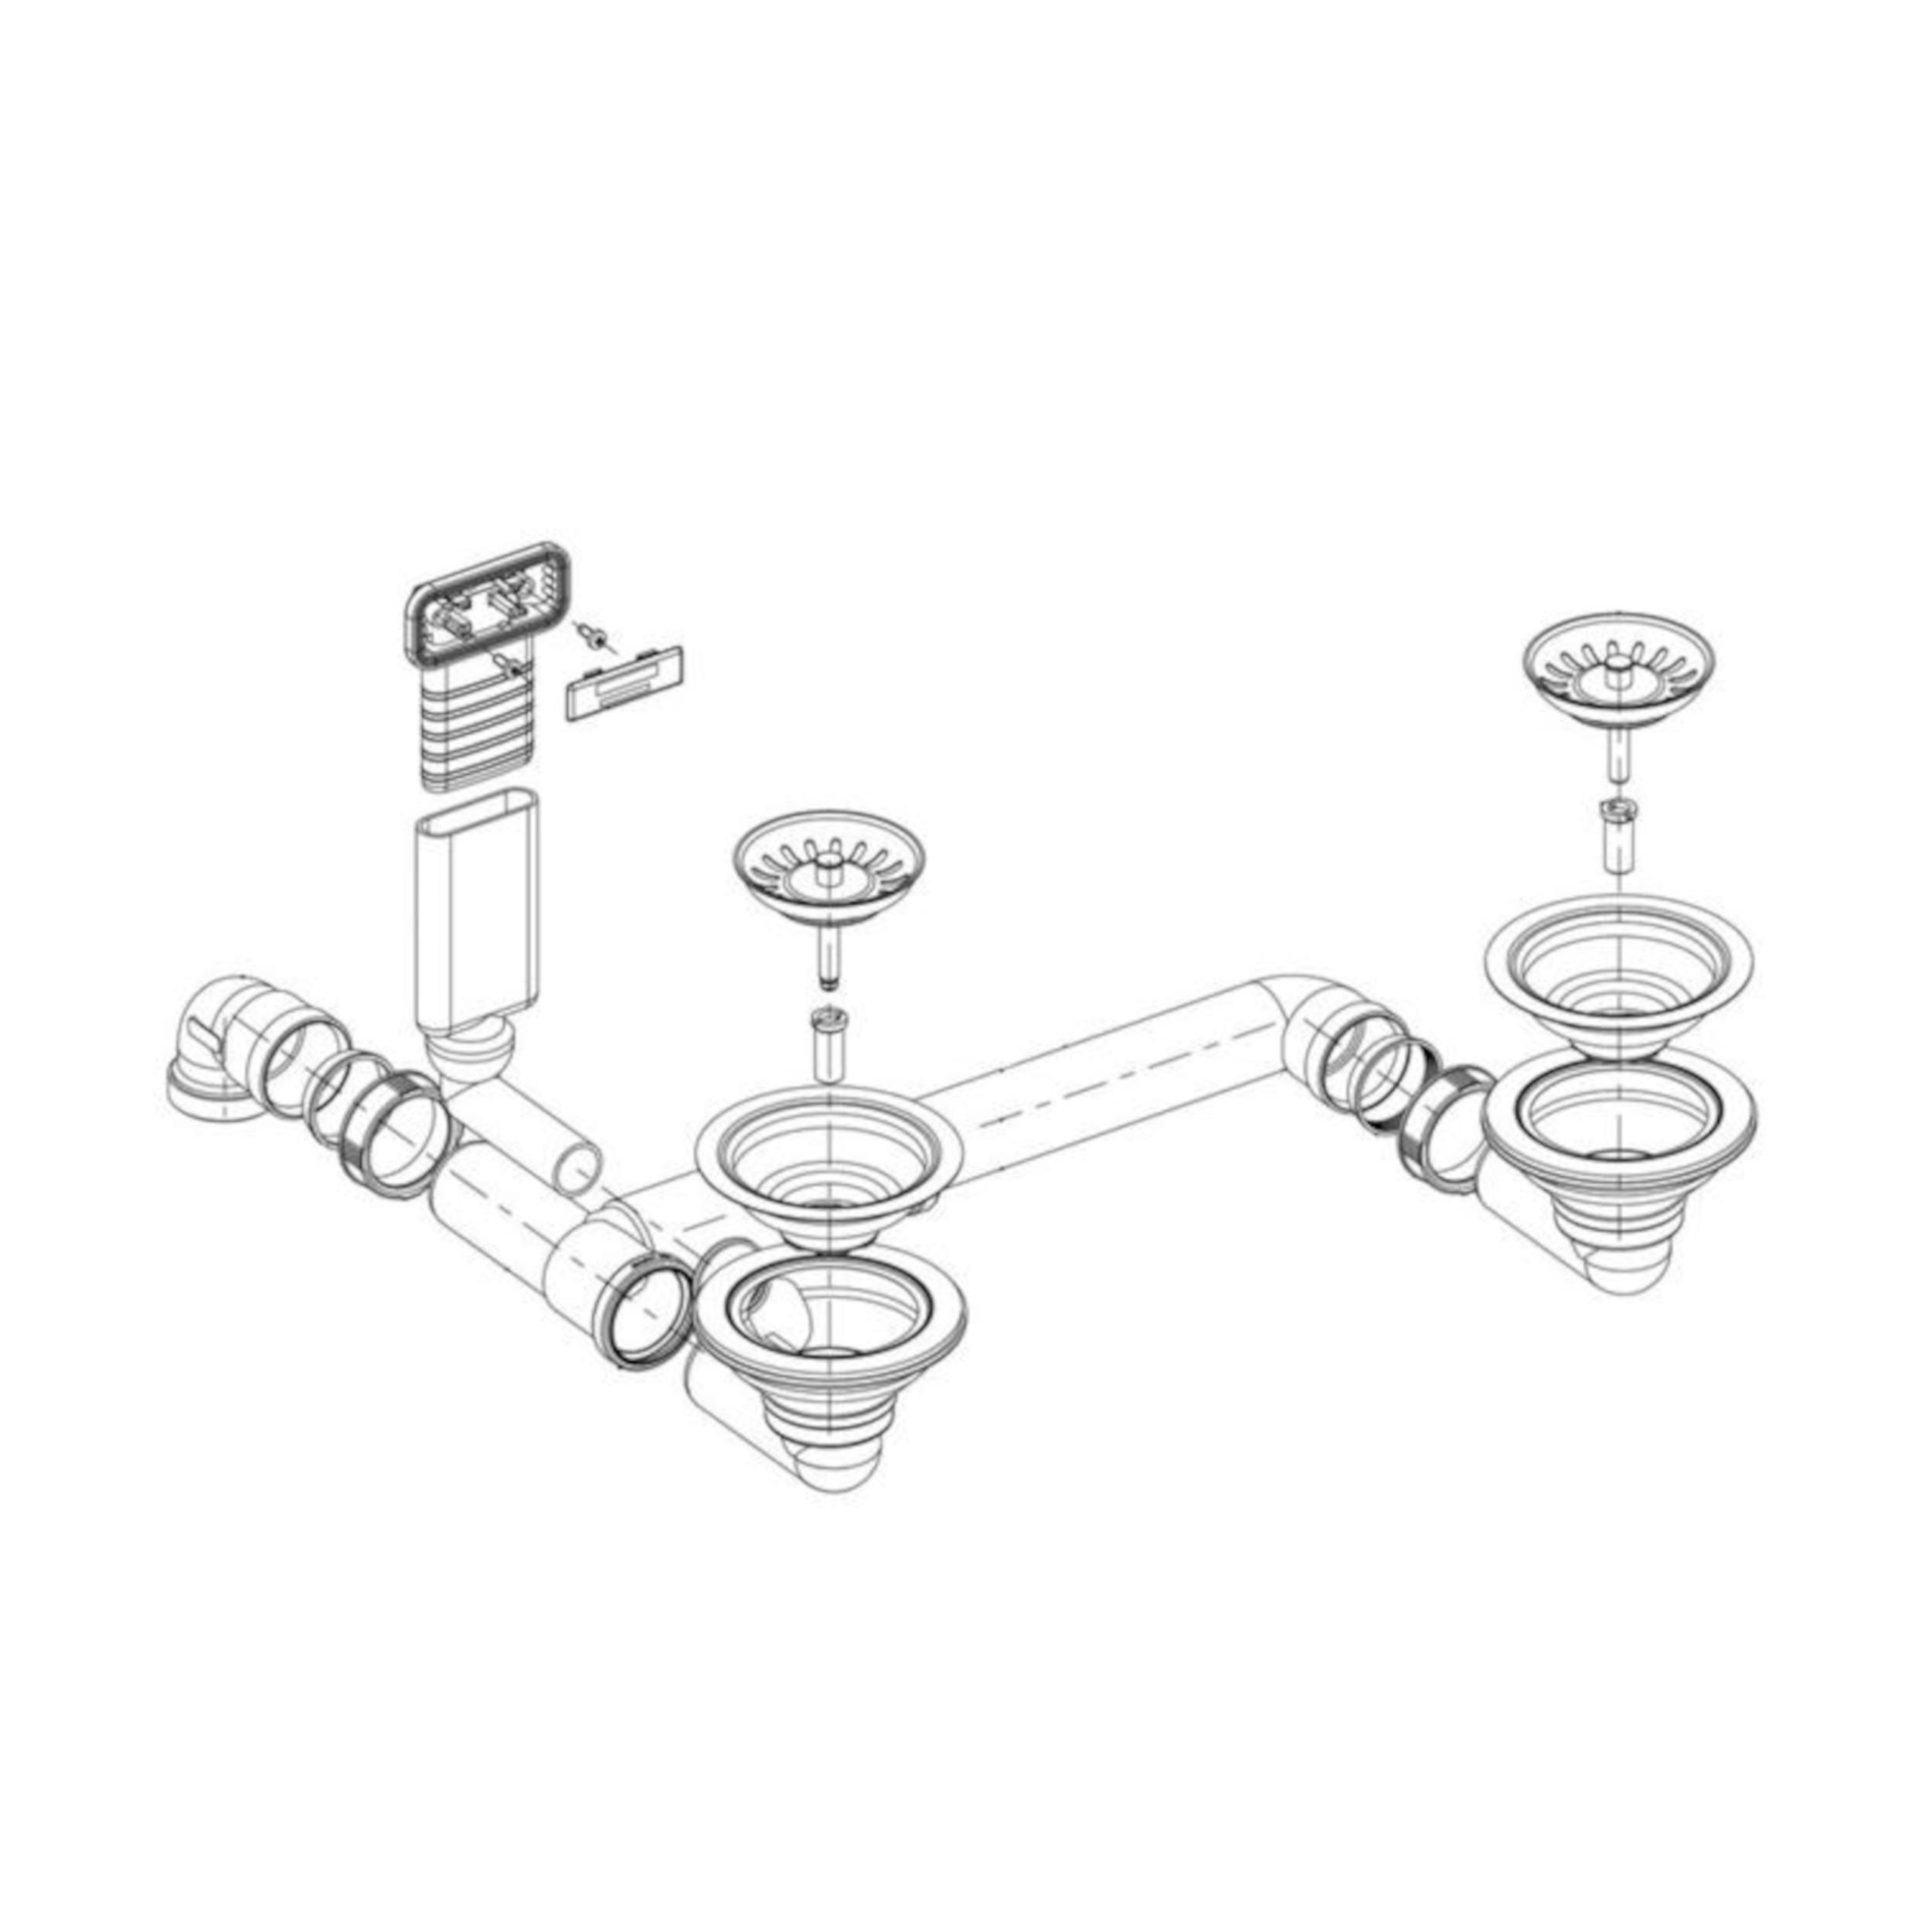 BLANCO Ablaufgarnitur 2 x 3,5'' ohne Ablauffernbedienung C-overflow modernes Sieb 225110